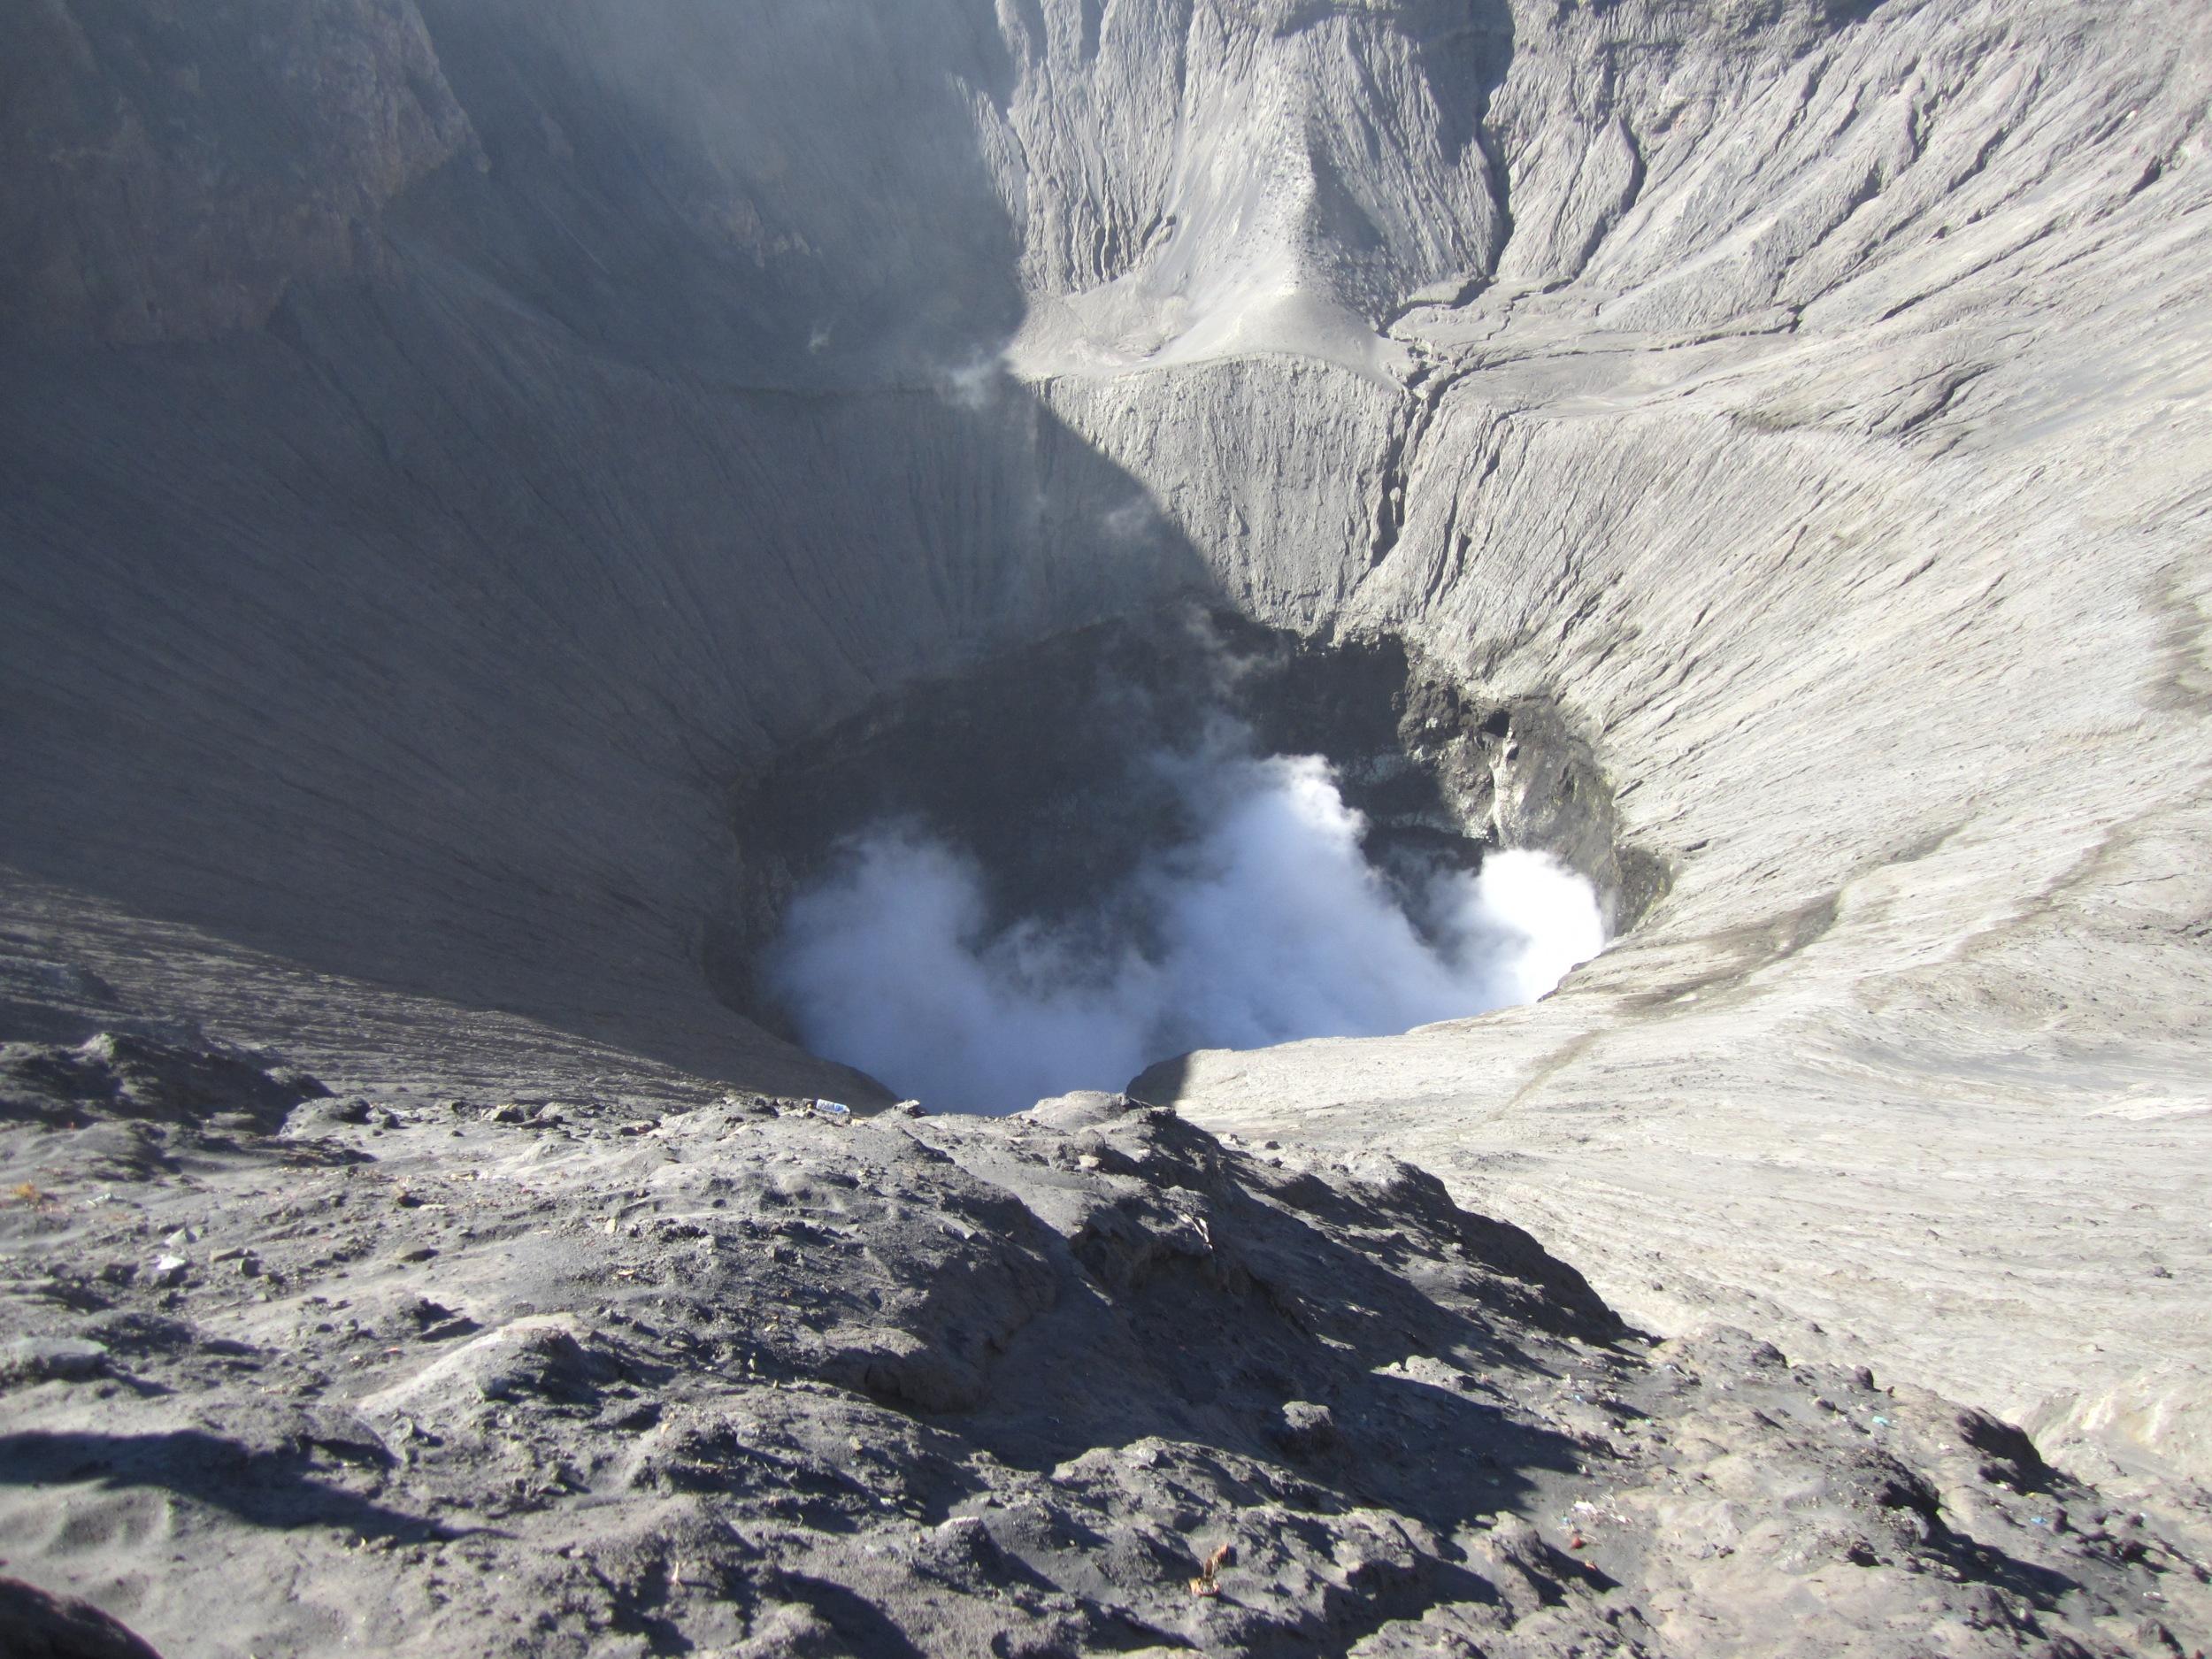 Bromo's massive crater spewing white sulphurous smoke